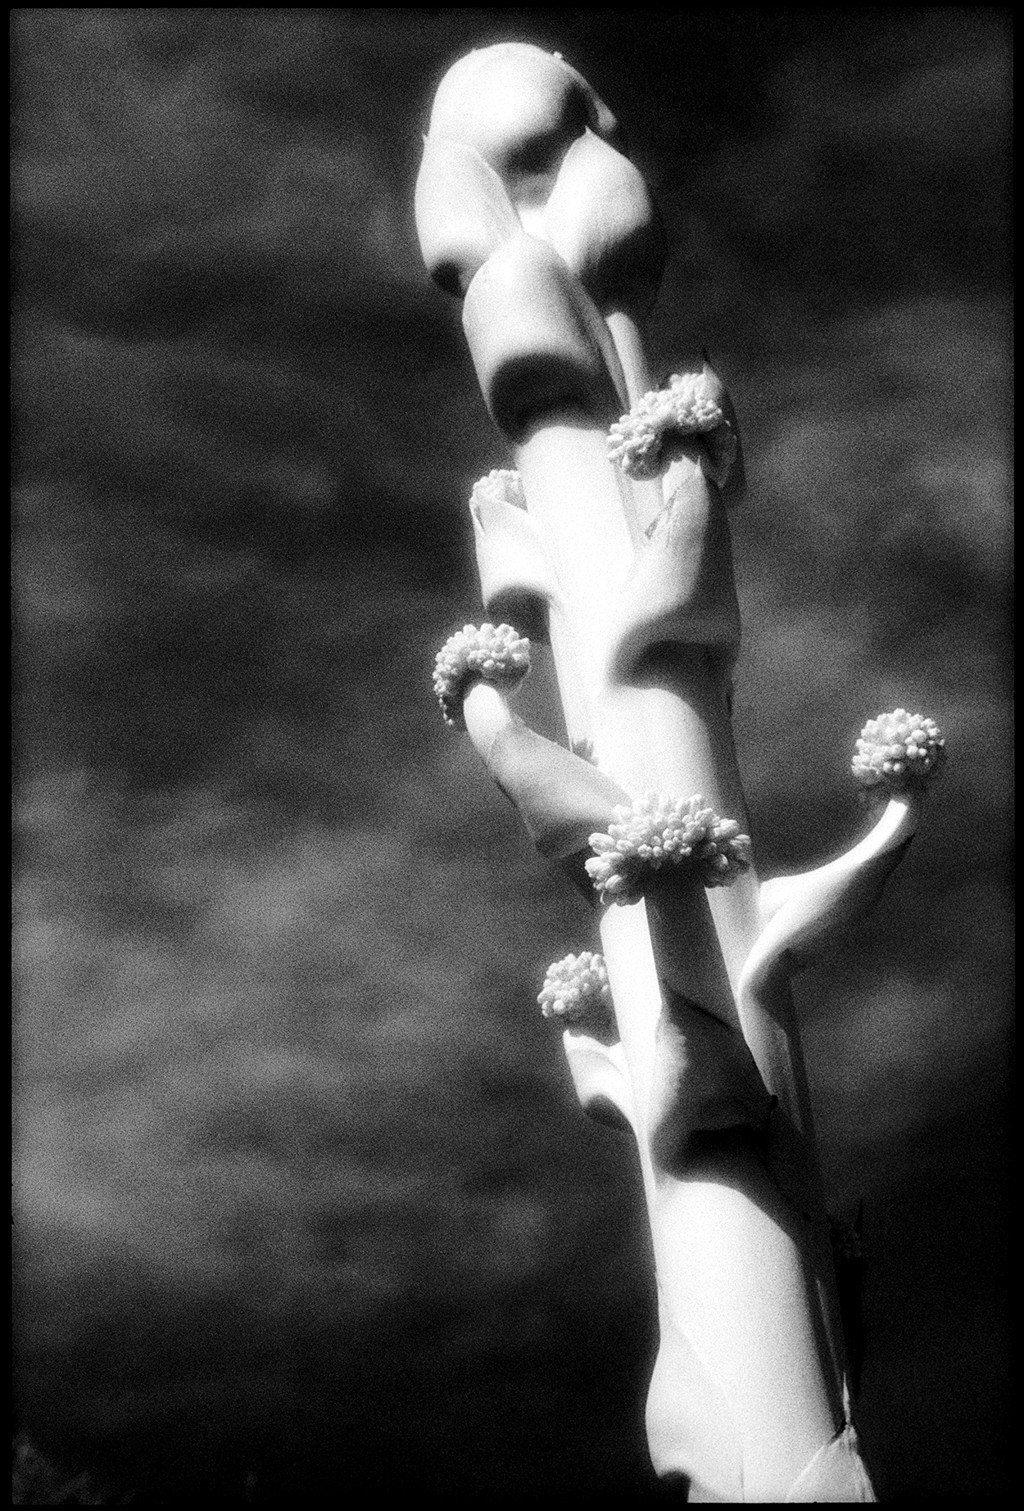 Agave Flower by Edward C. Alfano